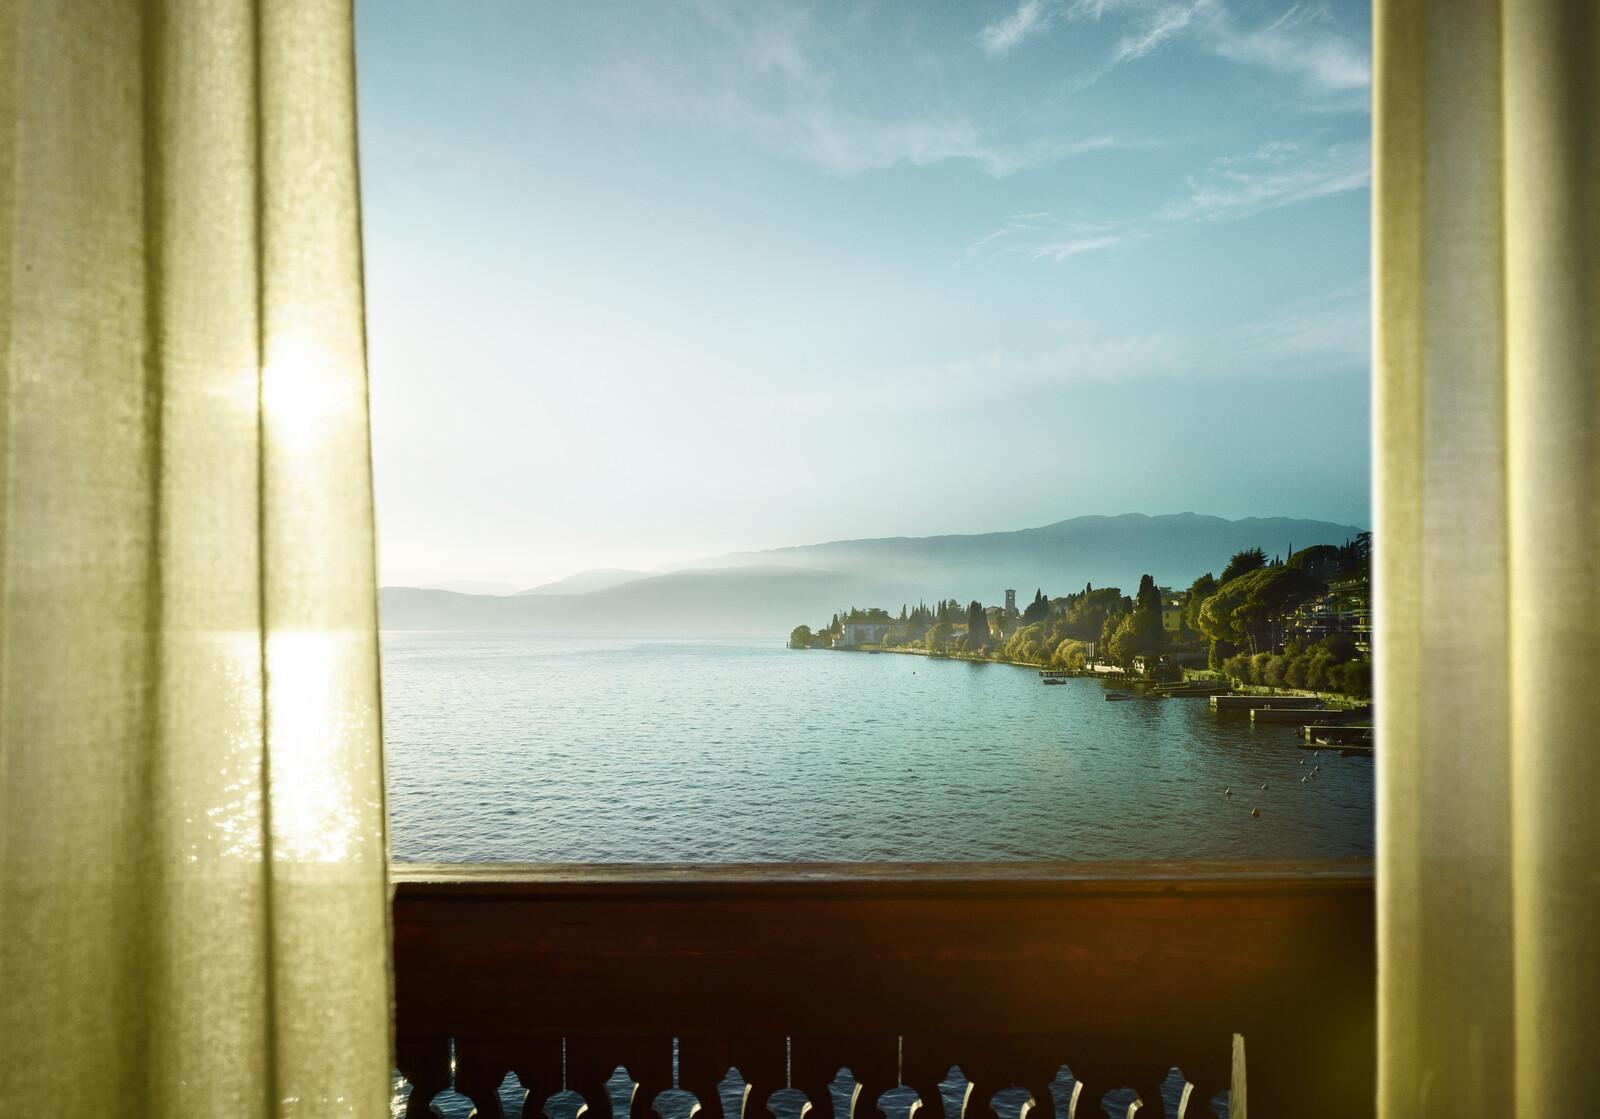 Lago di Garda - Erik Chmil